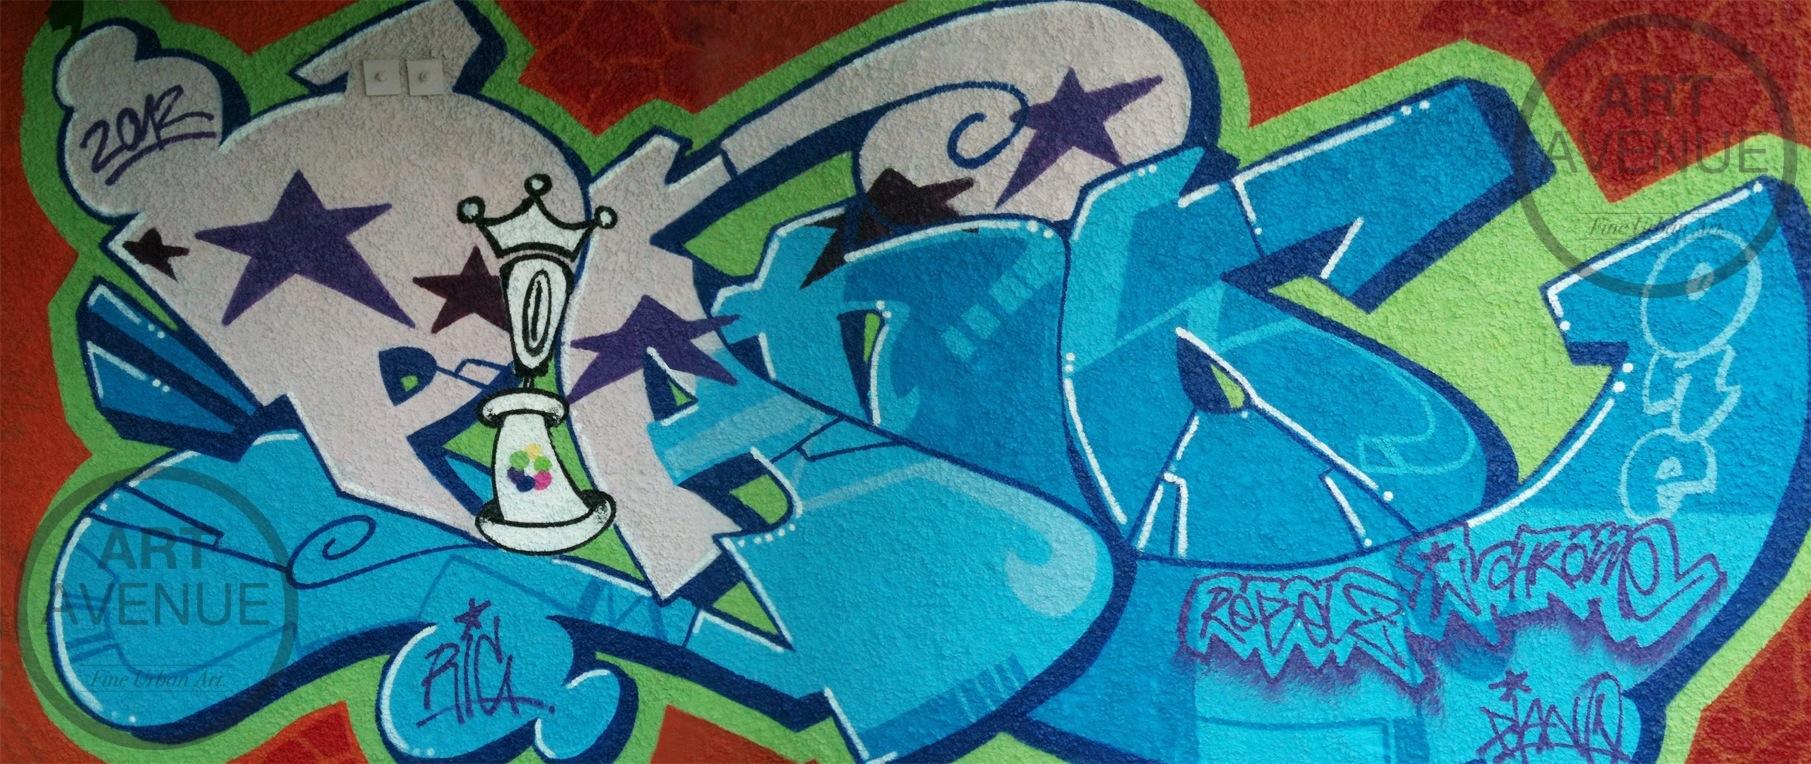 ART AVENUE: 25 Years Munich Oldschool Graffiti